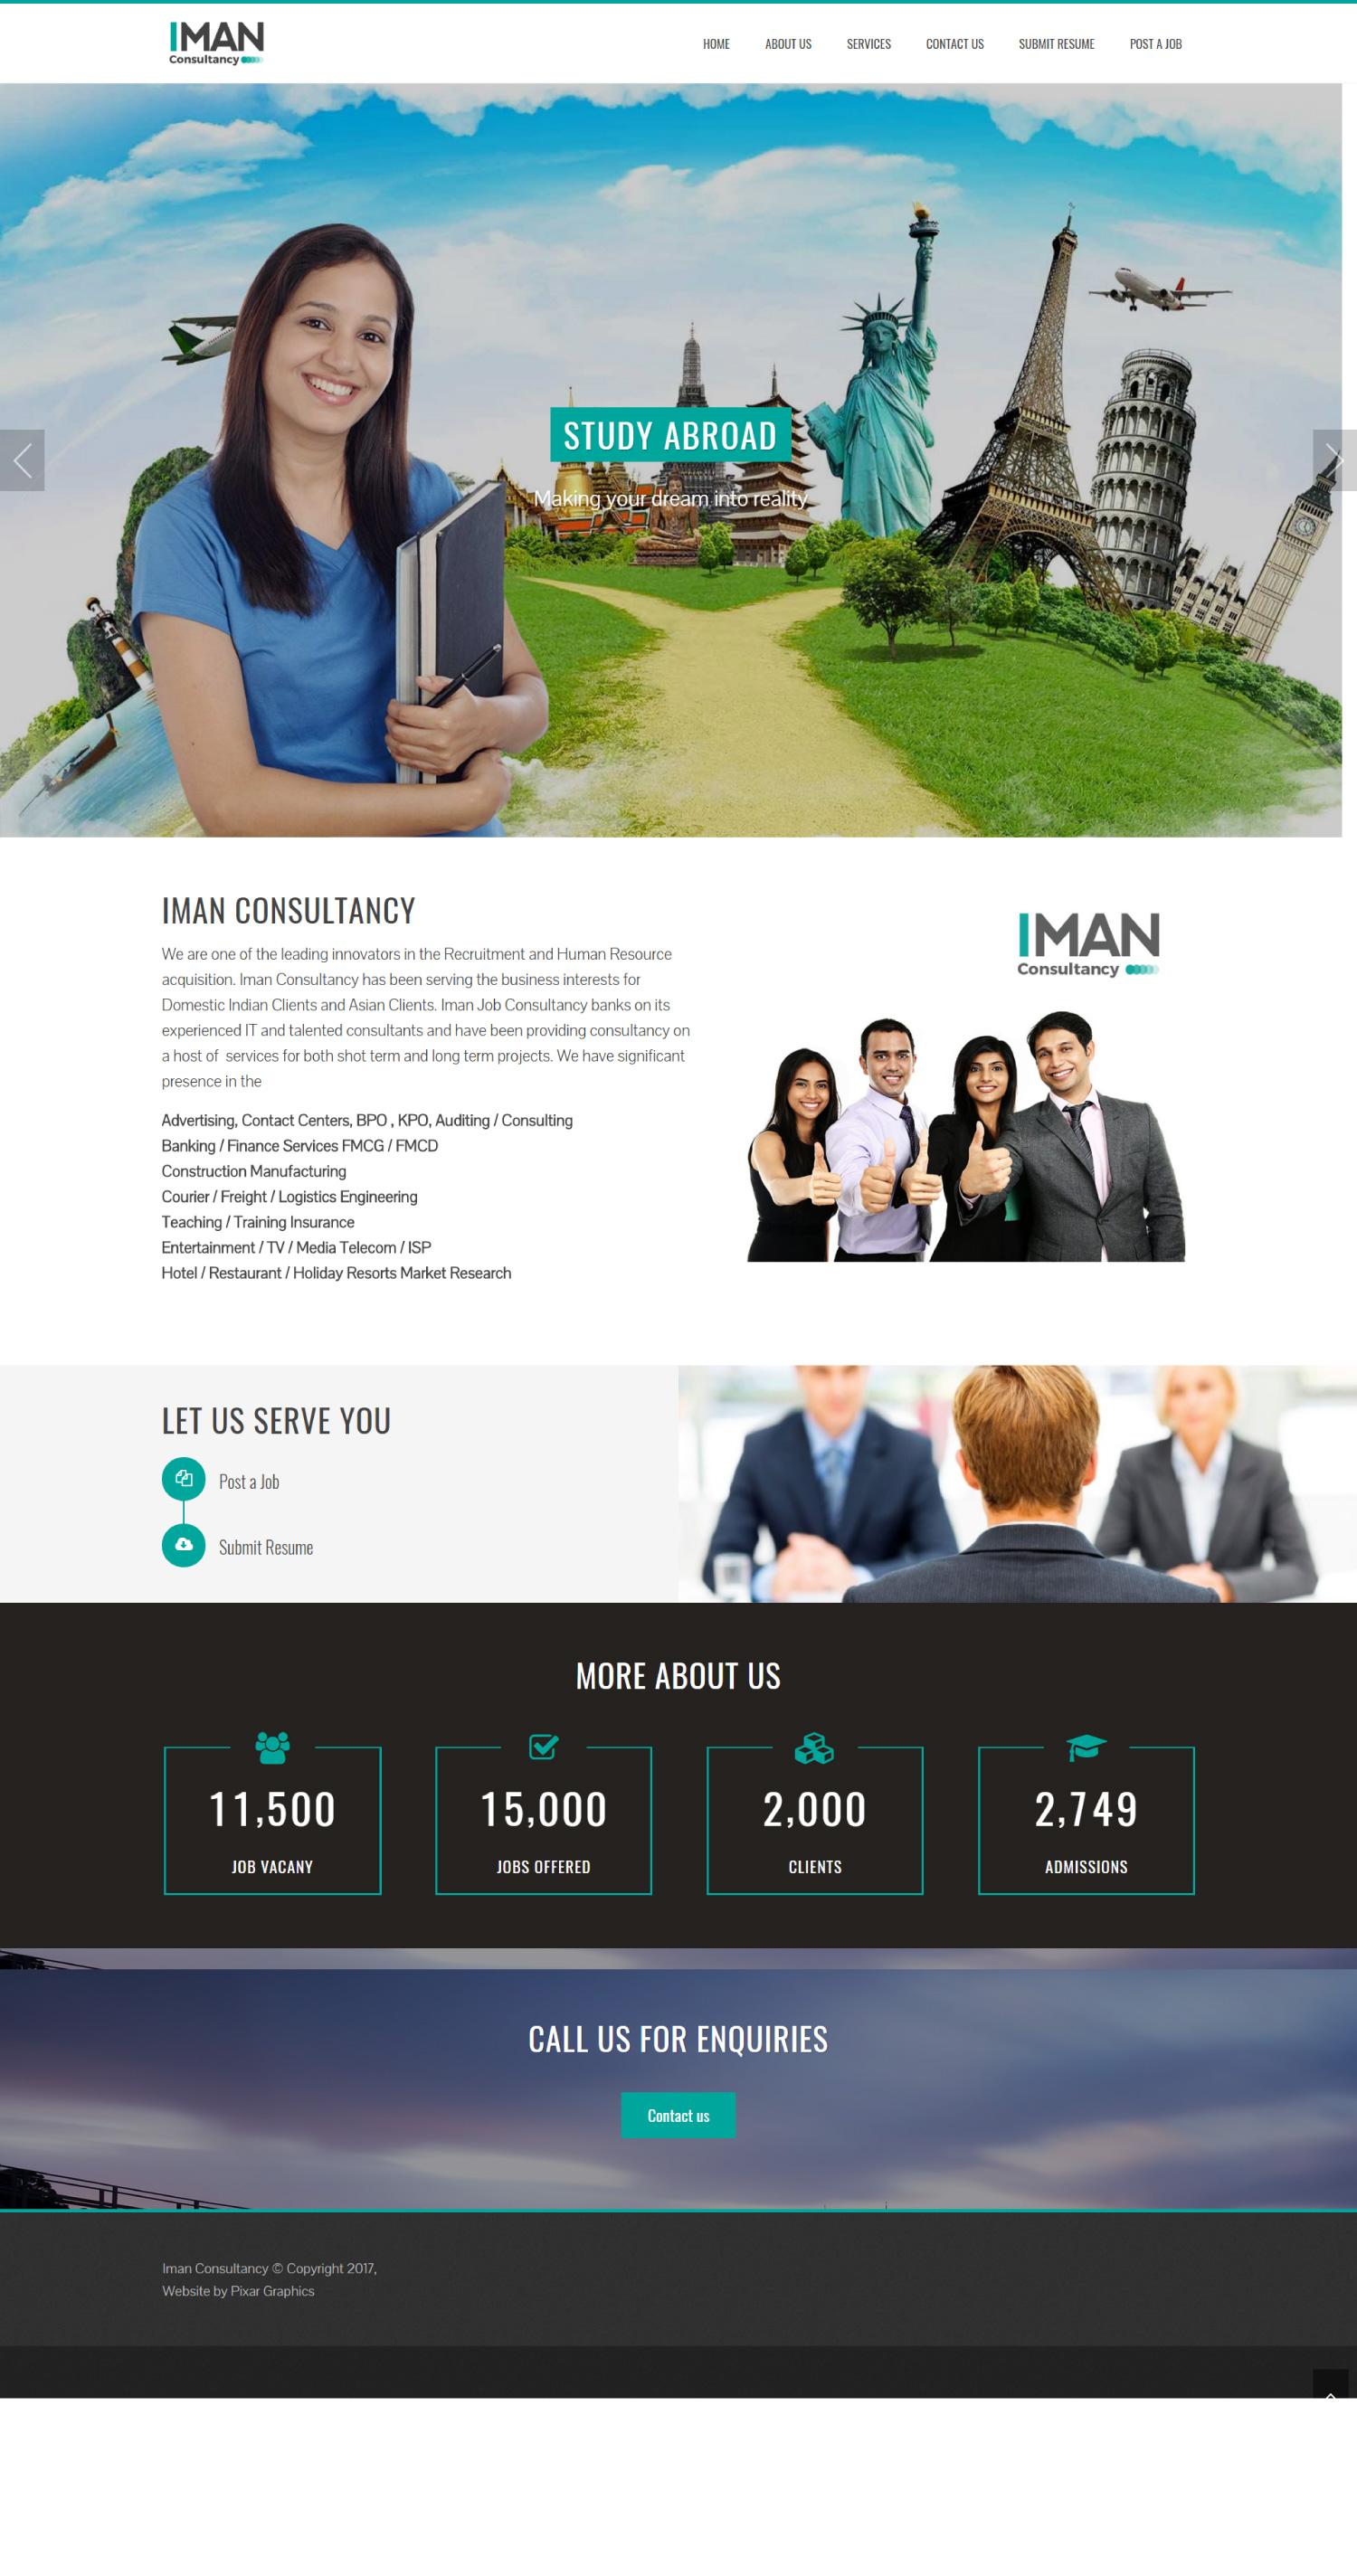 imanconsultancy.com